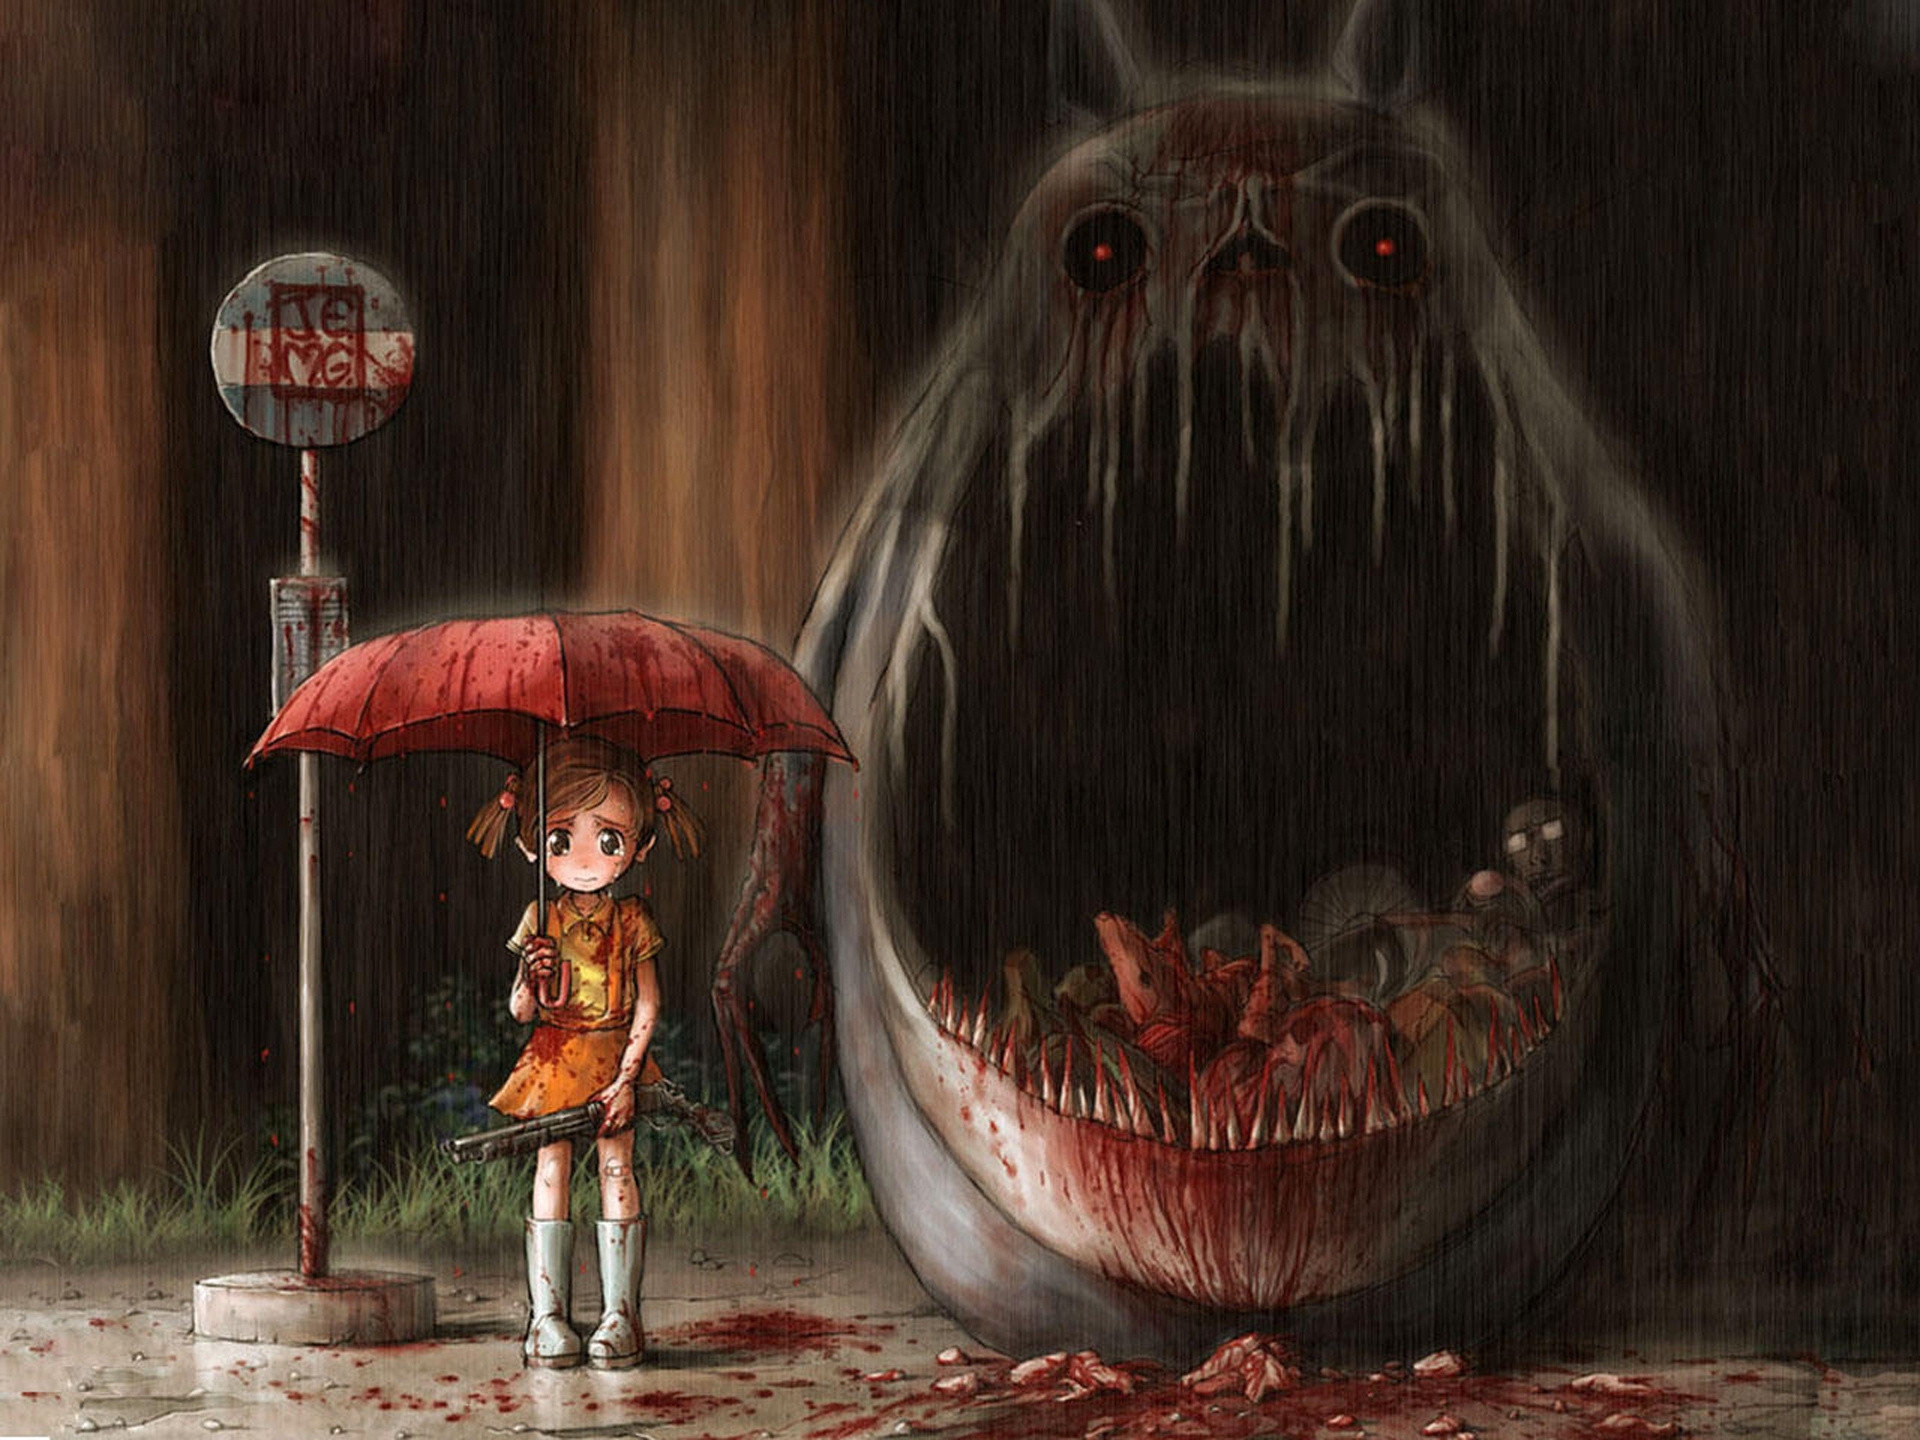 My Neighbor Totoro, monster, girl, gun, rain, umbrella, anime